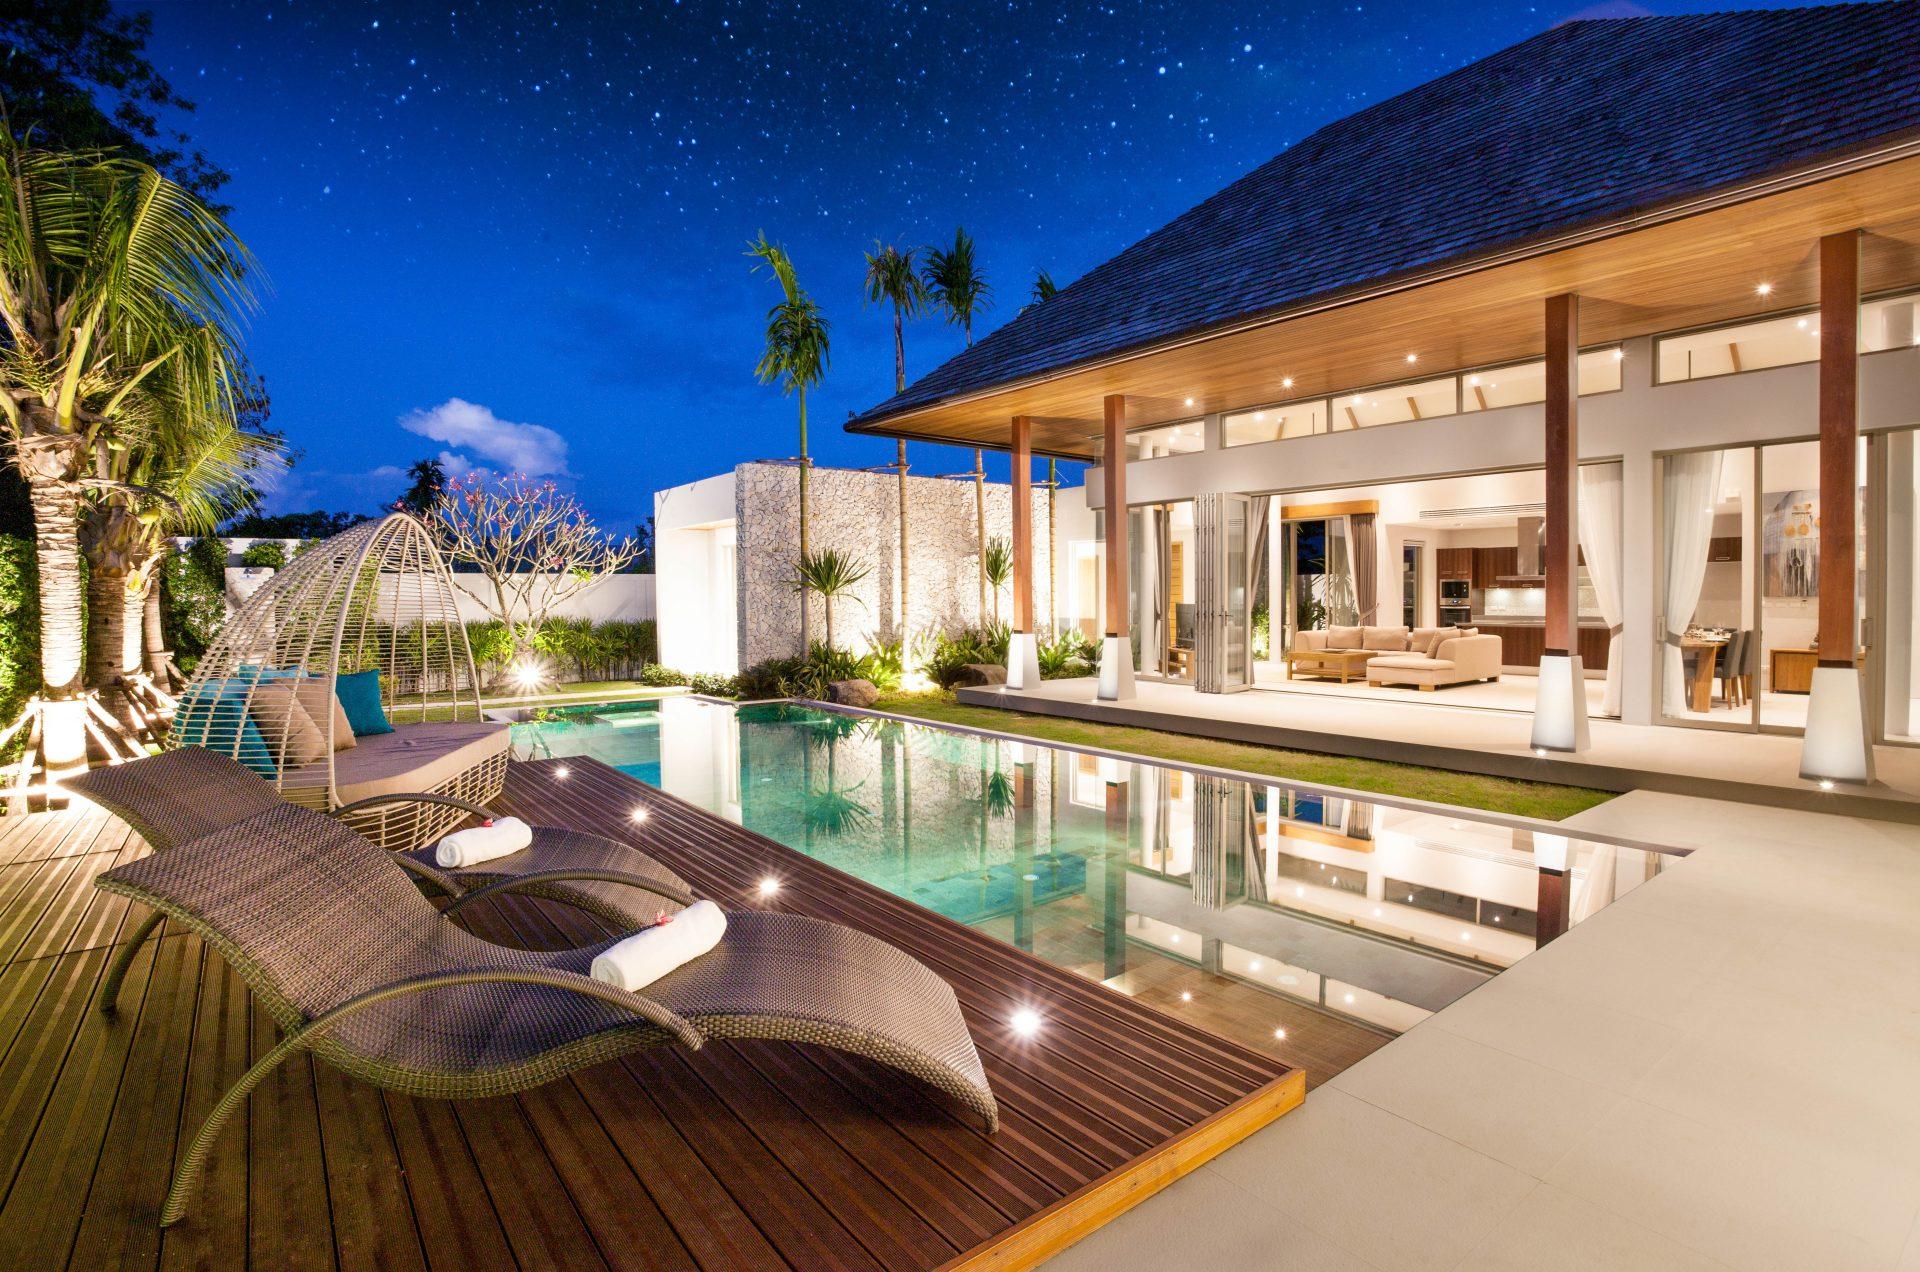 Botanica Villas Bang Tao – New Balinese-Style Pool Villas